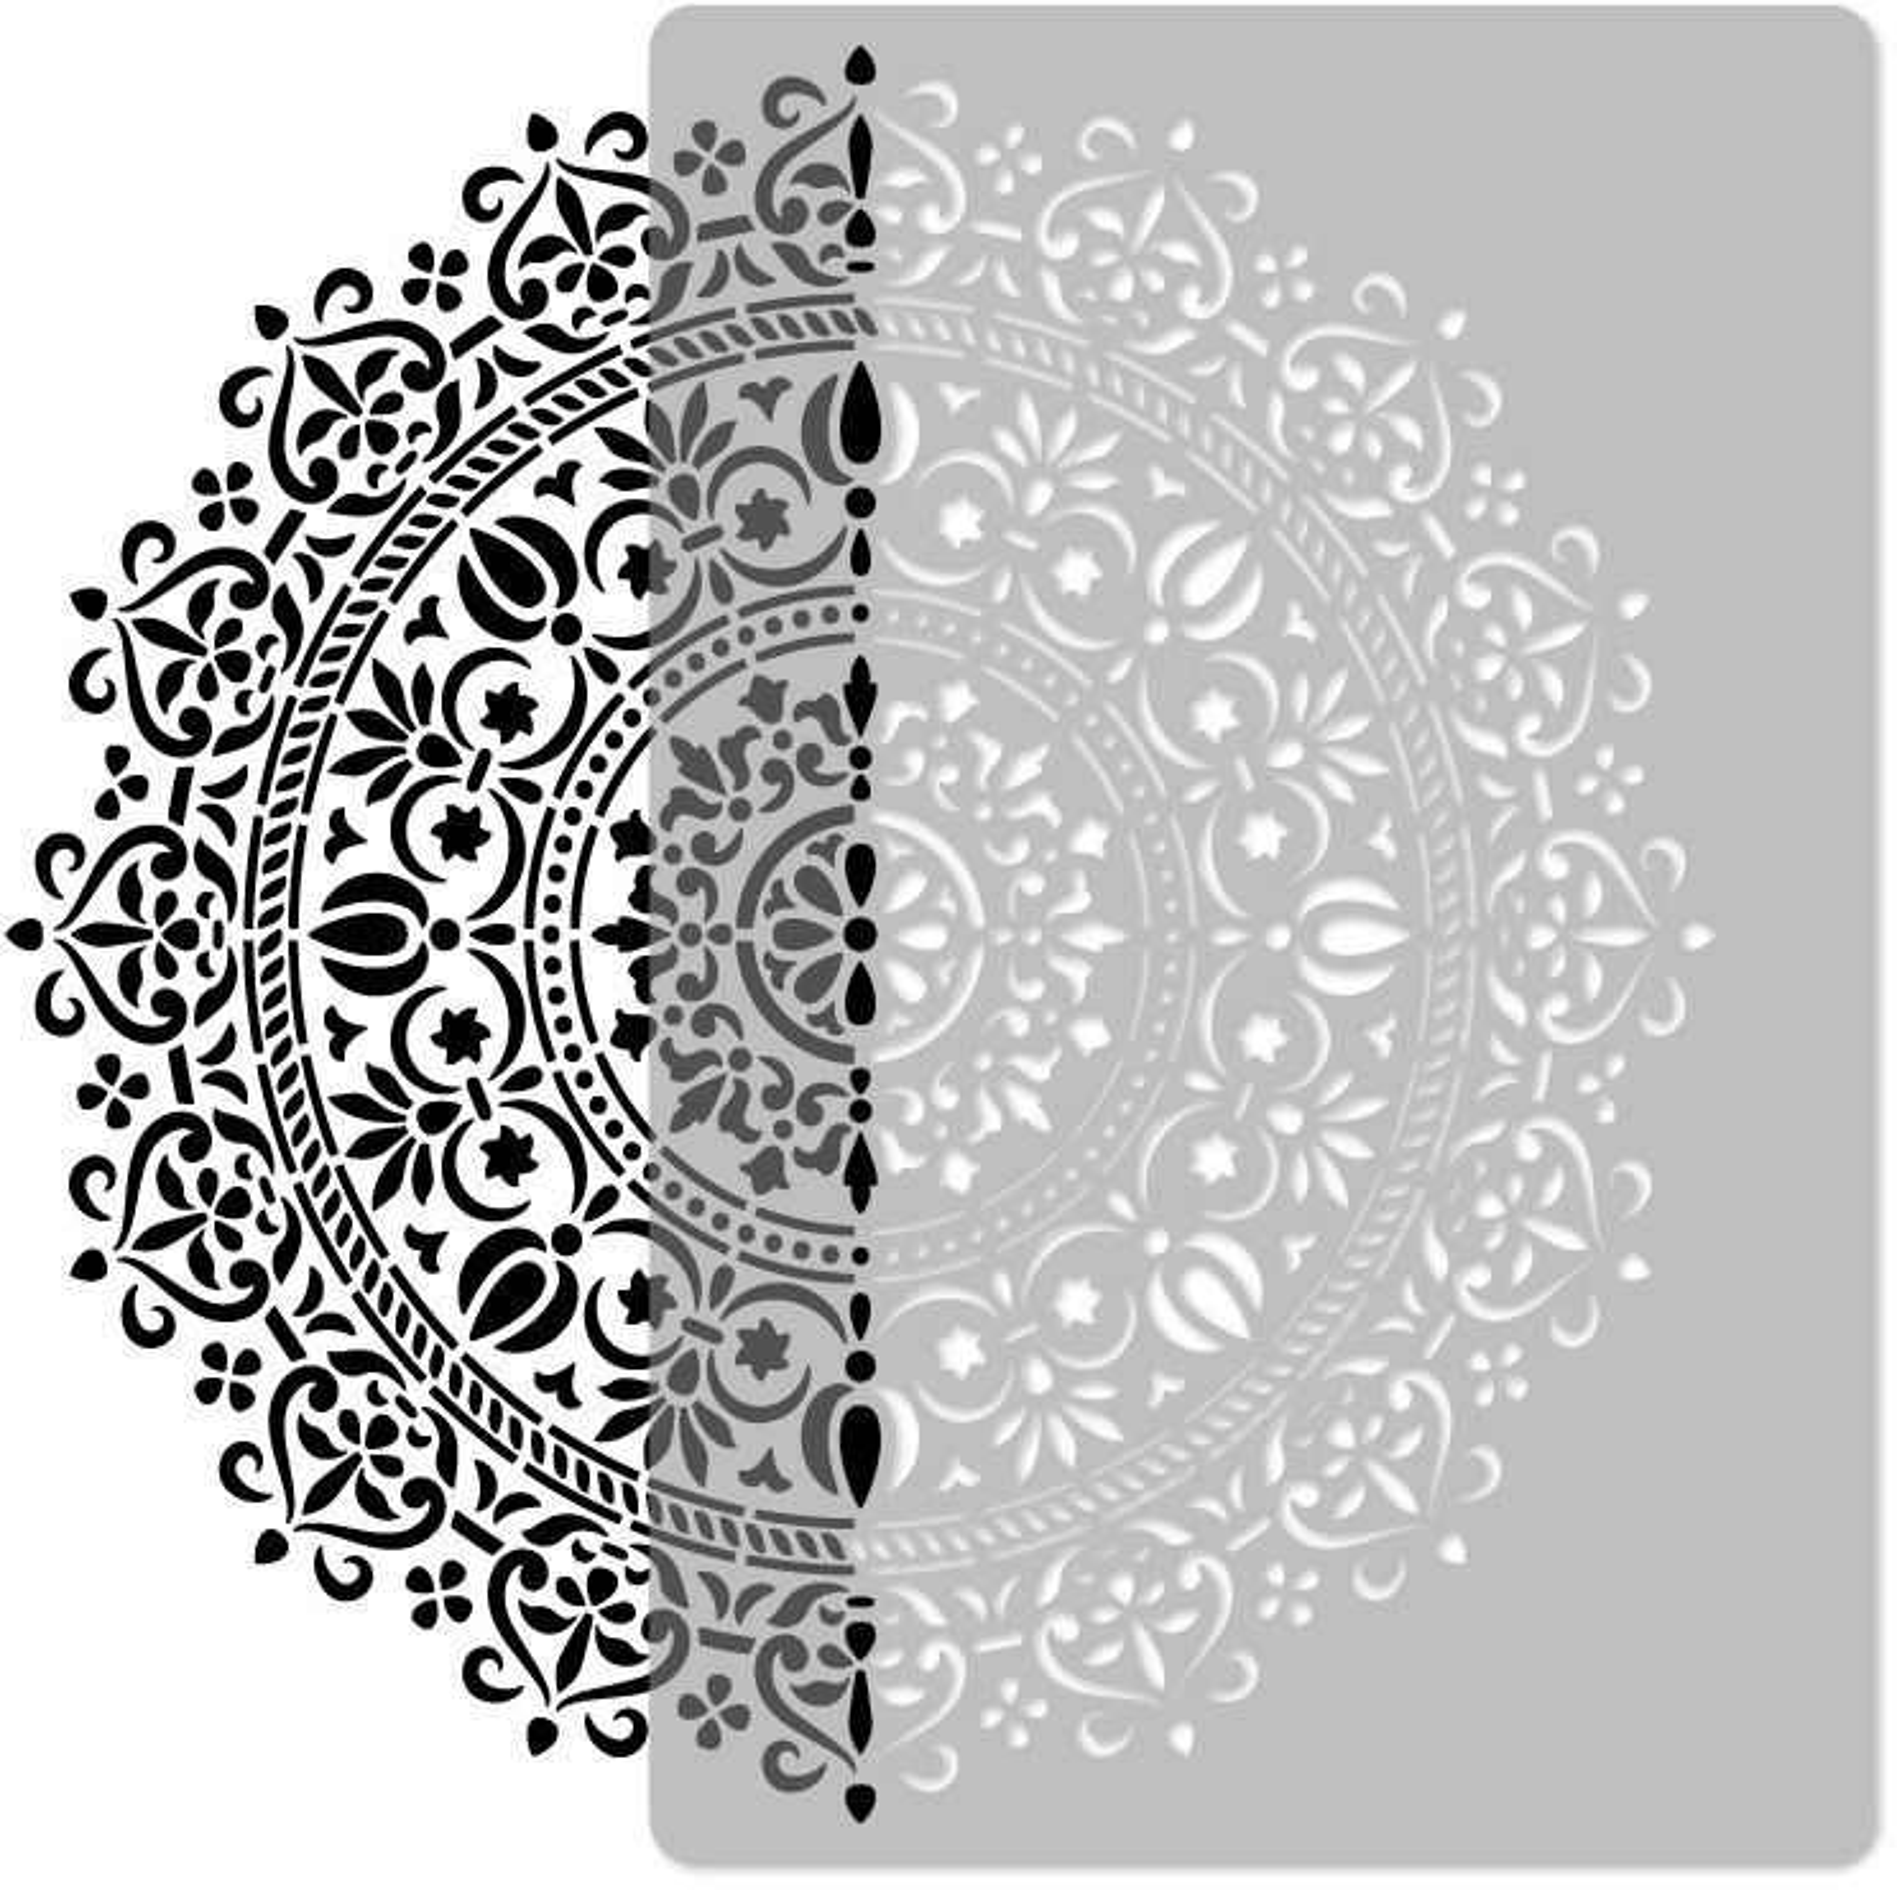 szablon malarski wielokrotny // MANDALA #01 - LARGE (65x95cm)